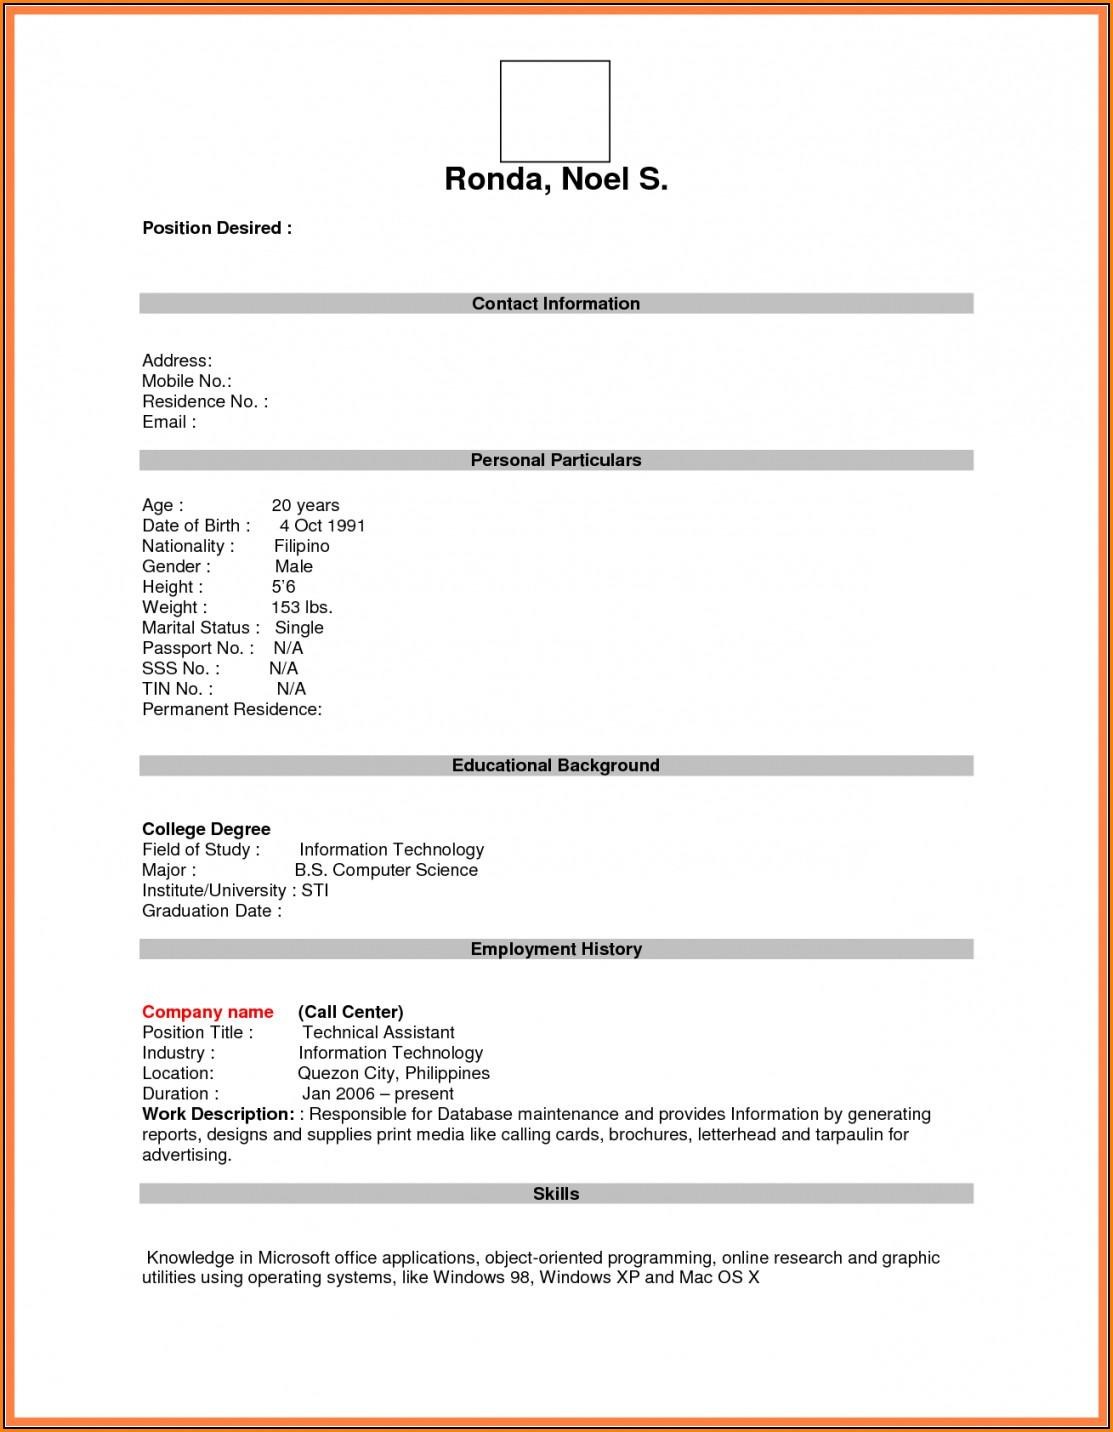 Blank Resume Form For Job Application Download